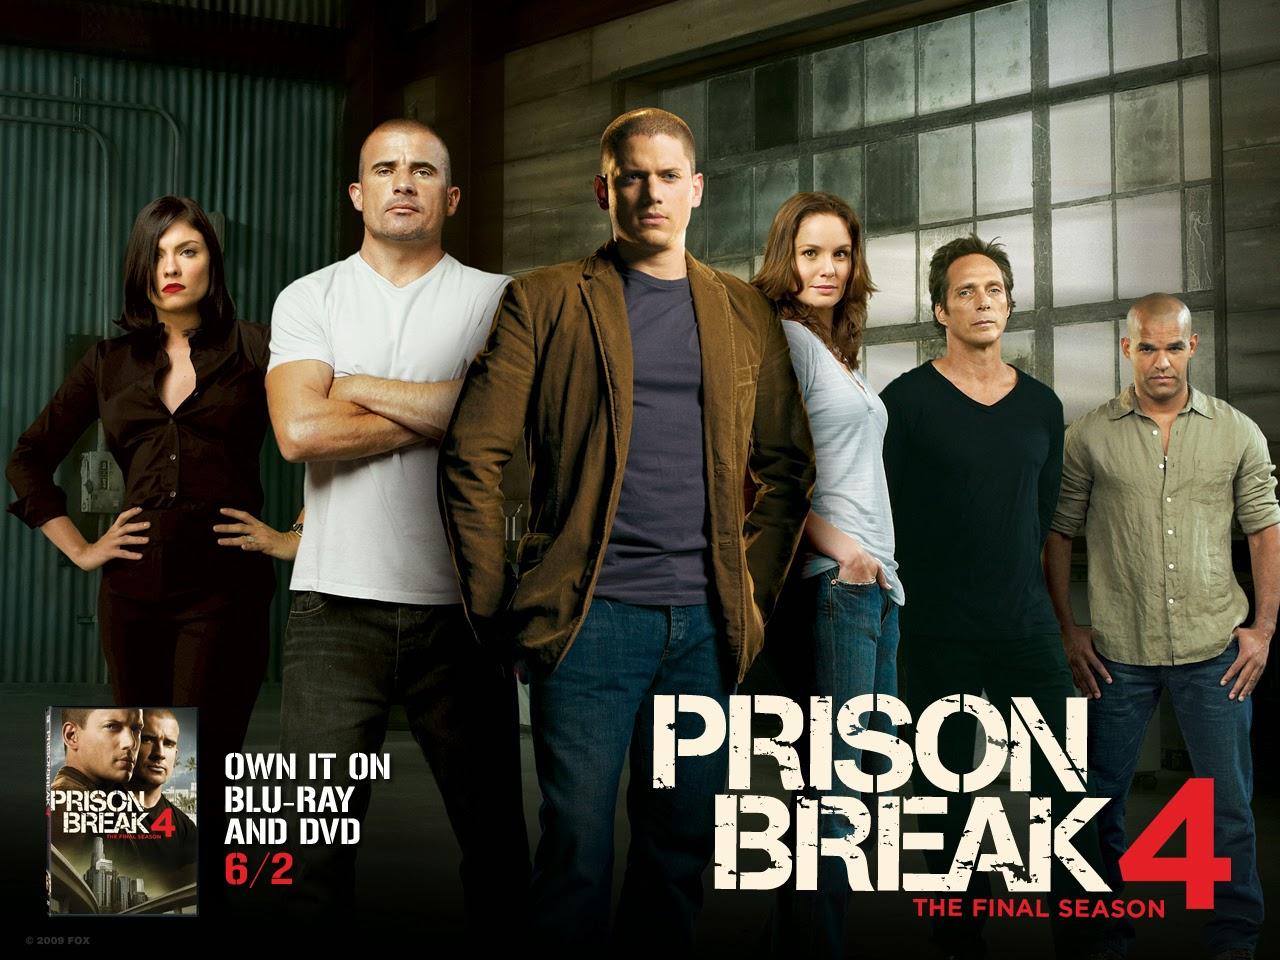 One Torrent Download Arabic تحميل تورنت Prison Break All Seasons Series Torrent وان تورنت Onetorrentdownload Blogspot Com